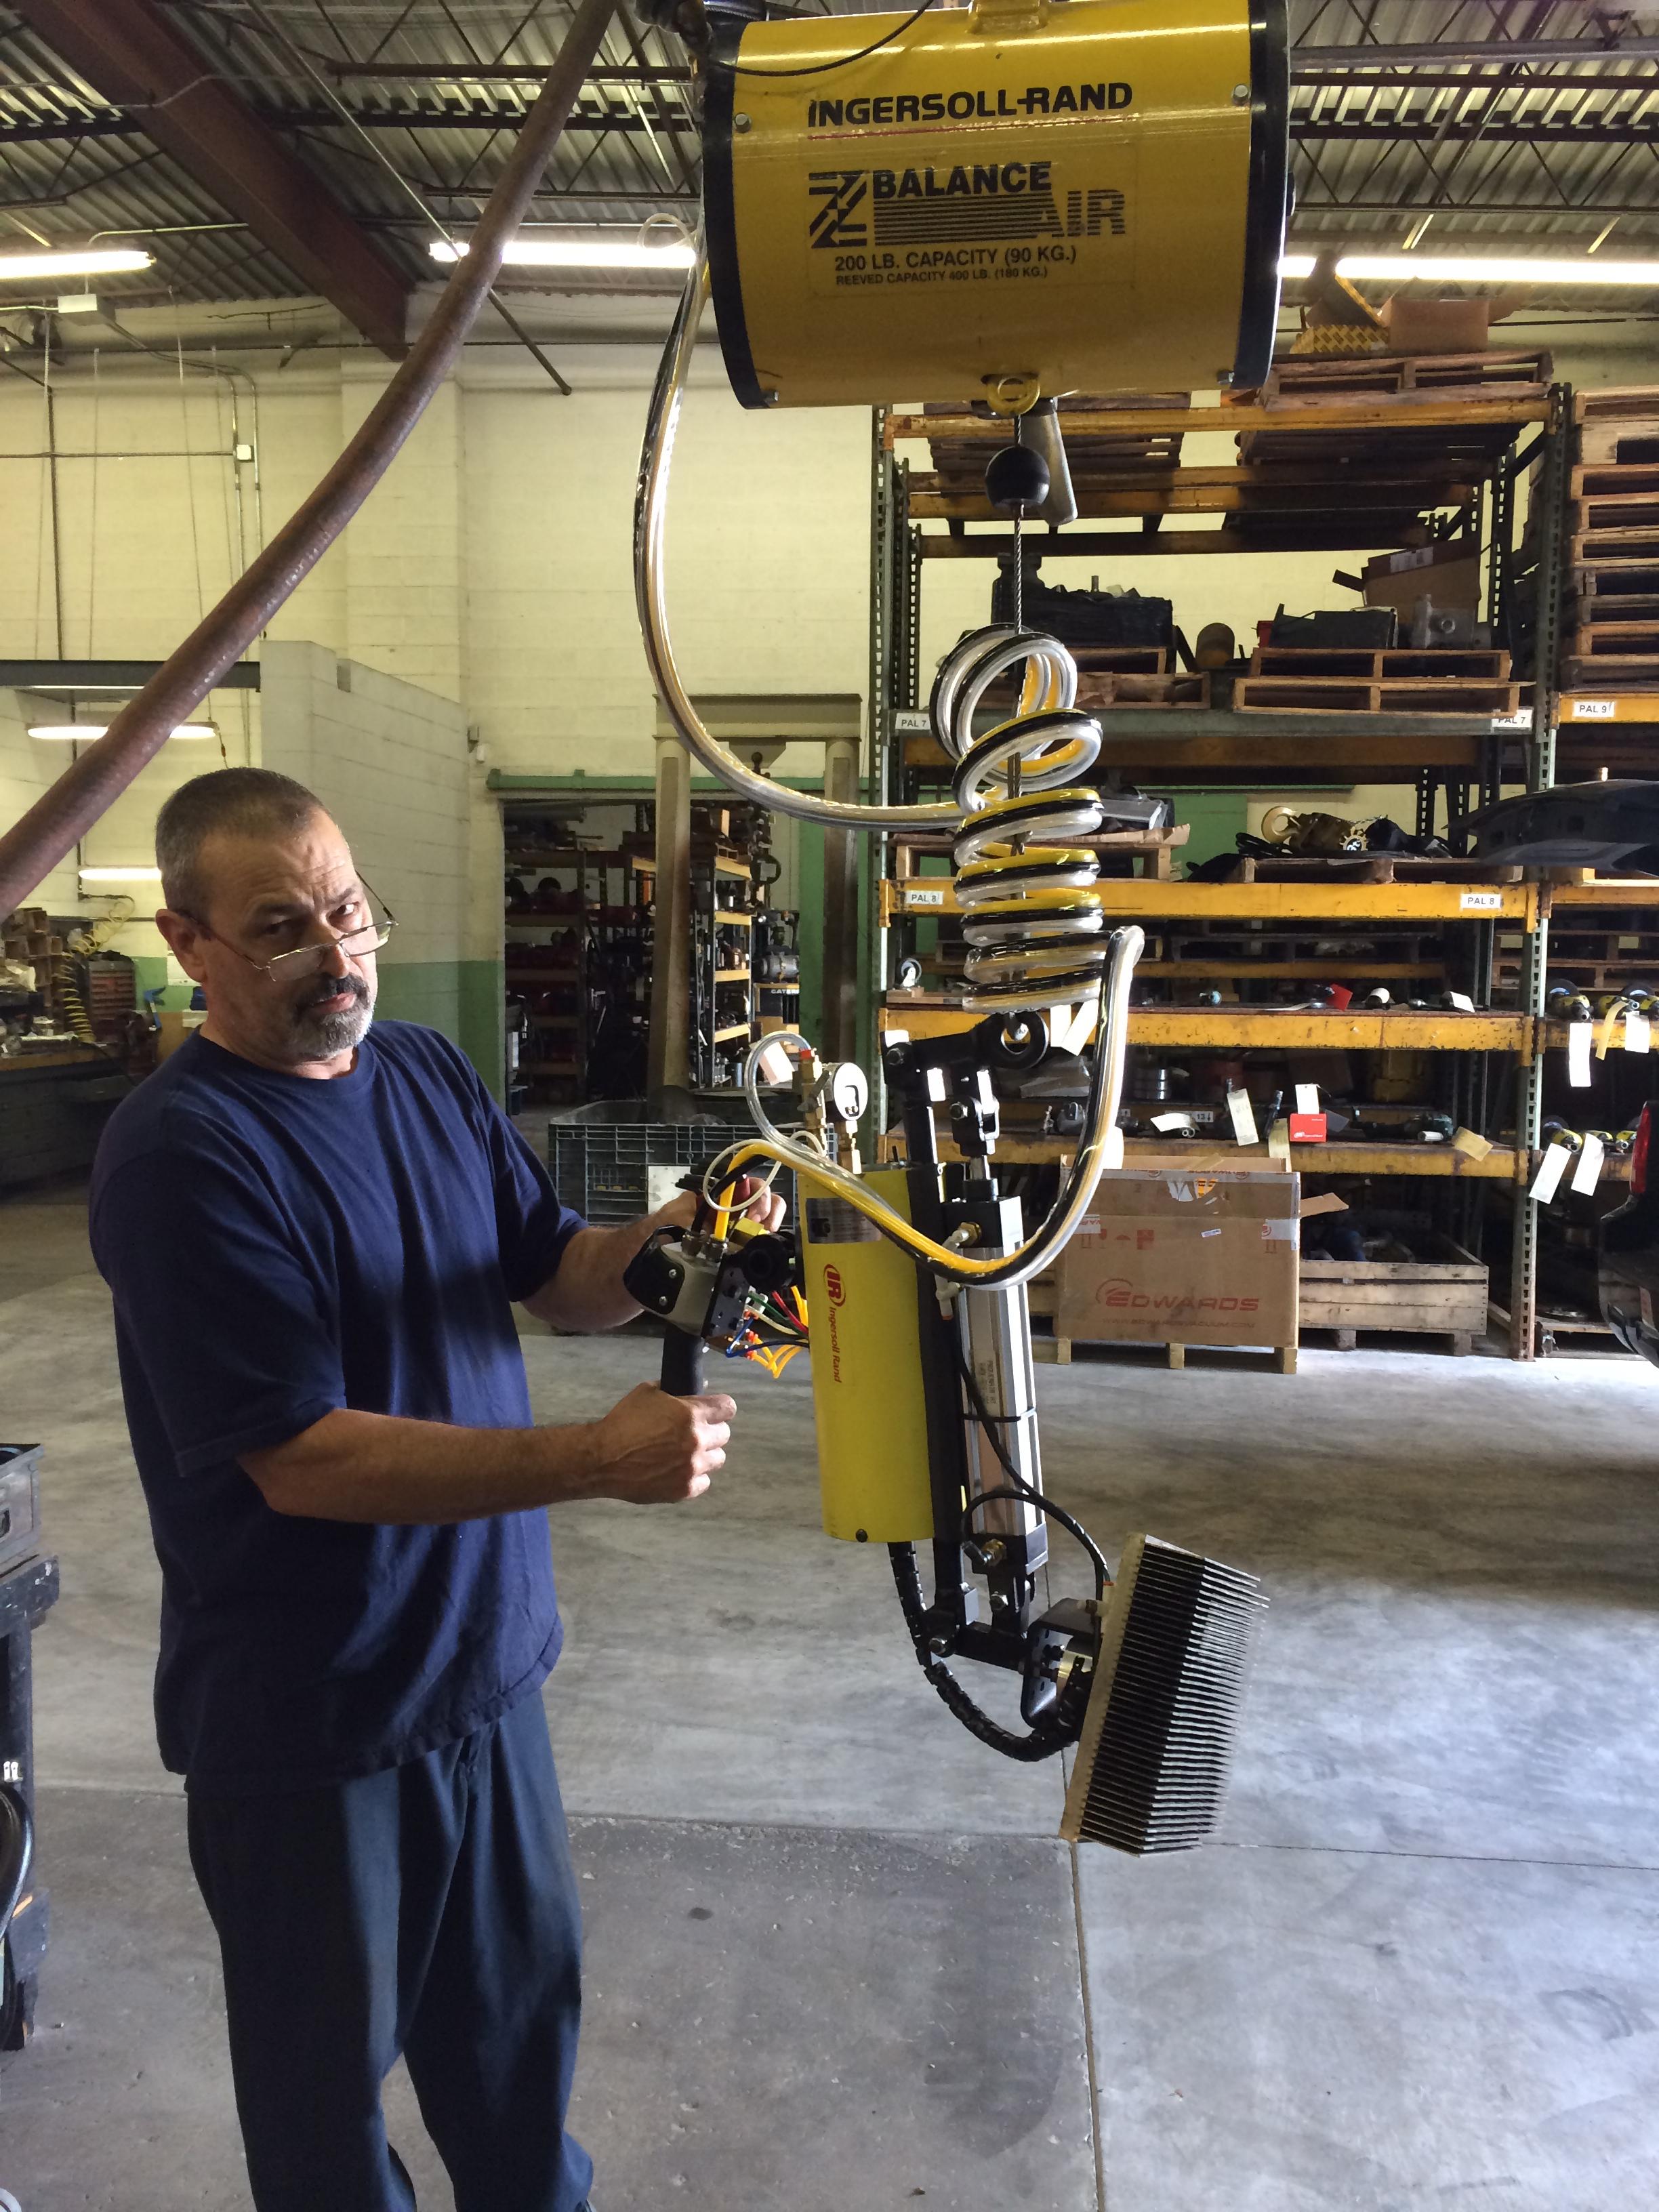 Tool Lift Assist : Ergonomic lift assist ohio tool systems